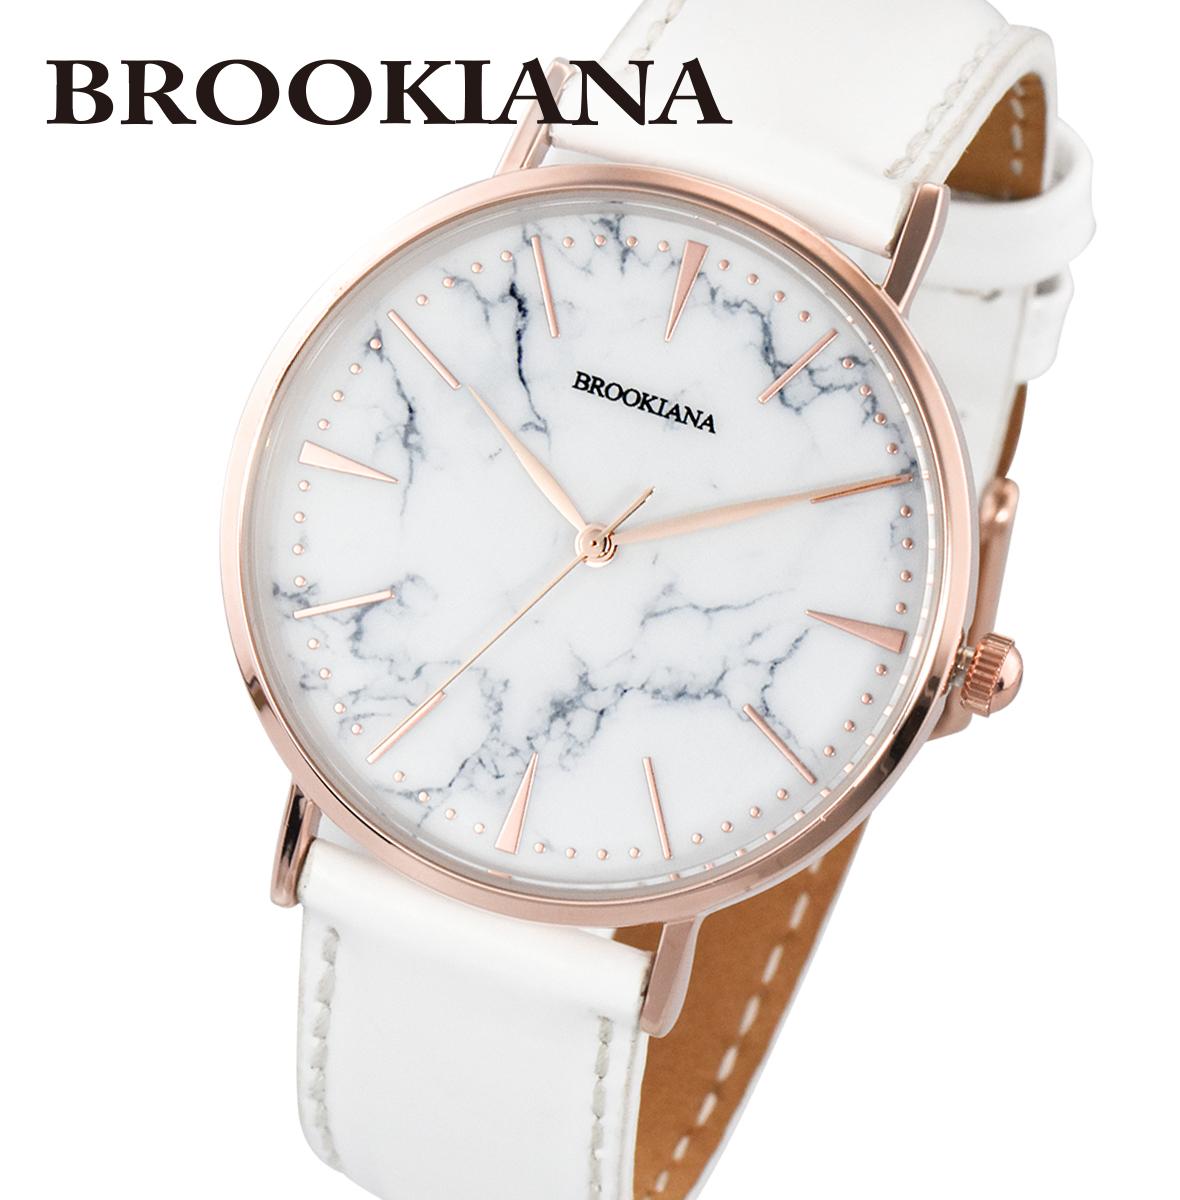 f9138f38d7 ブラウン メンズ ブルッキアーナ 腕時計 ブラウン (1) レディースマザーオブパール ブラック (2) 時計 36mm BA3101RPWLWH/  (5) RPWLBR/ BPBLBK/ ラウンドスリムシェル ...